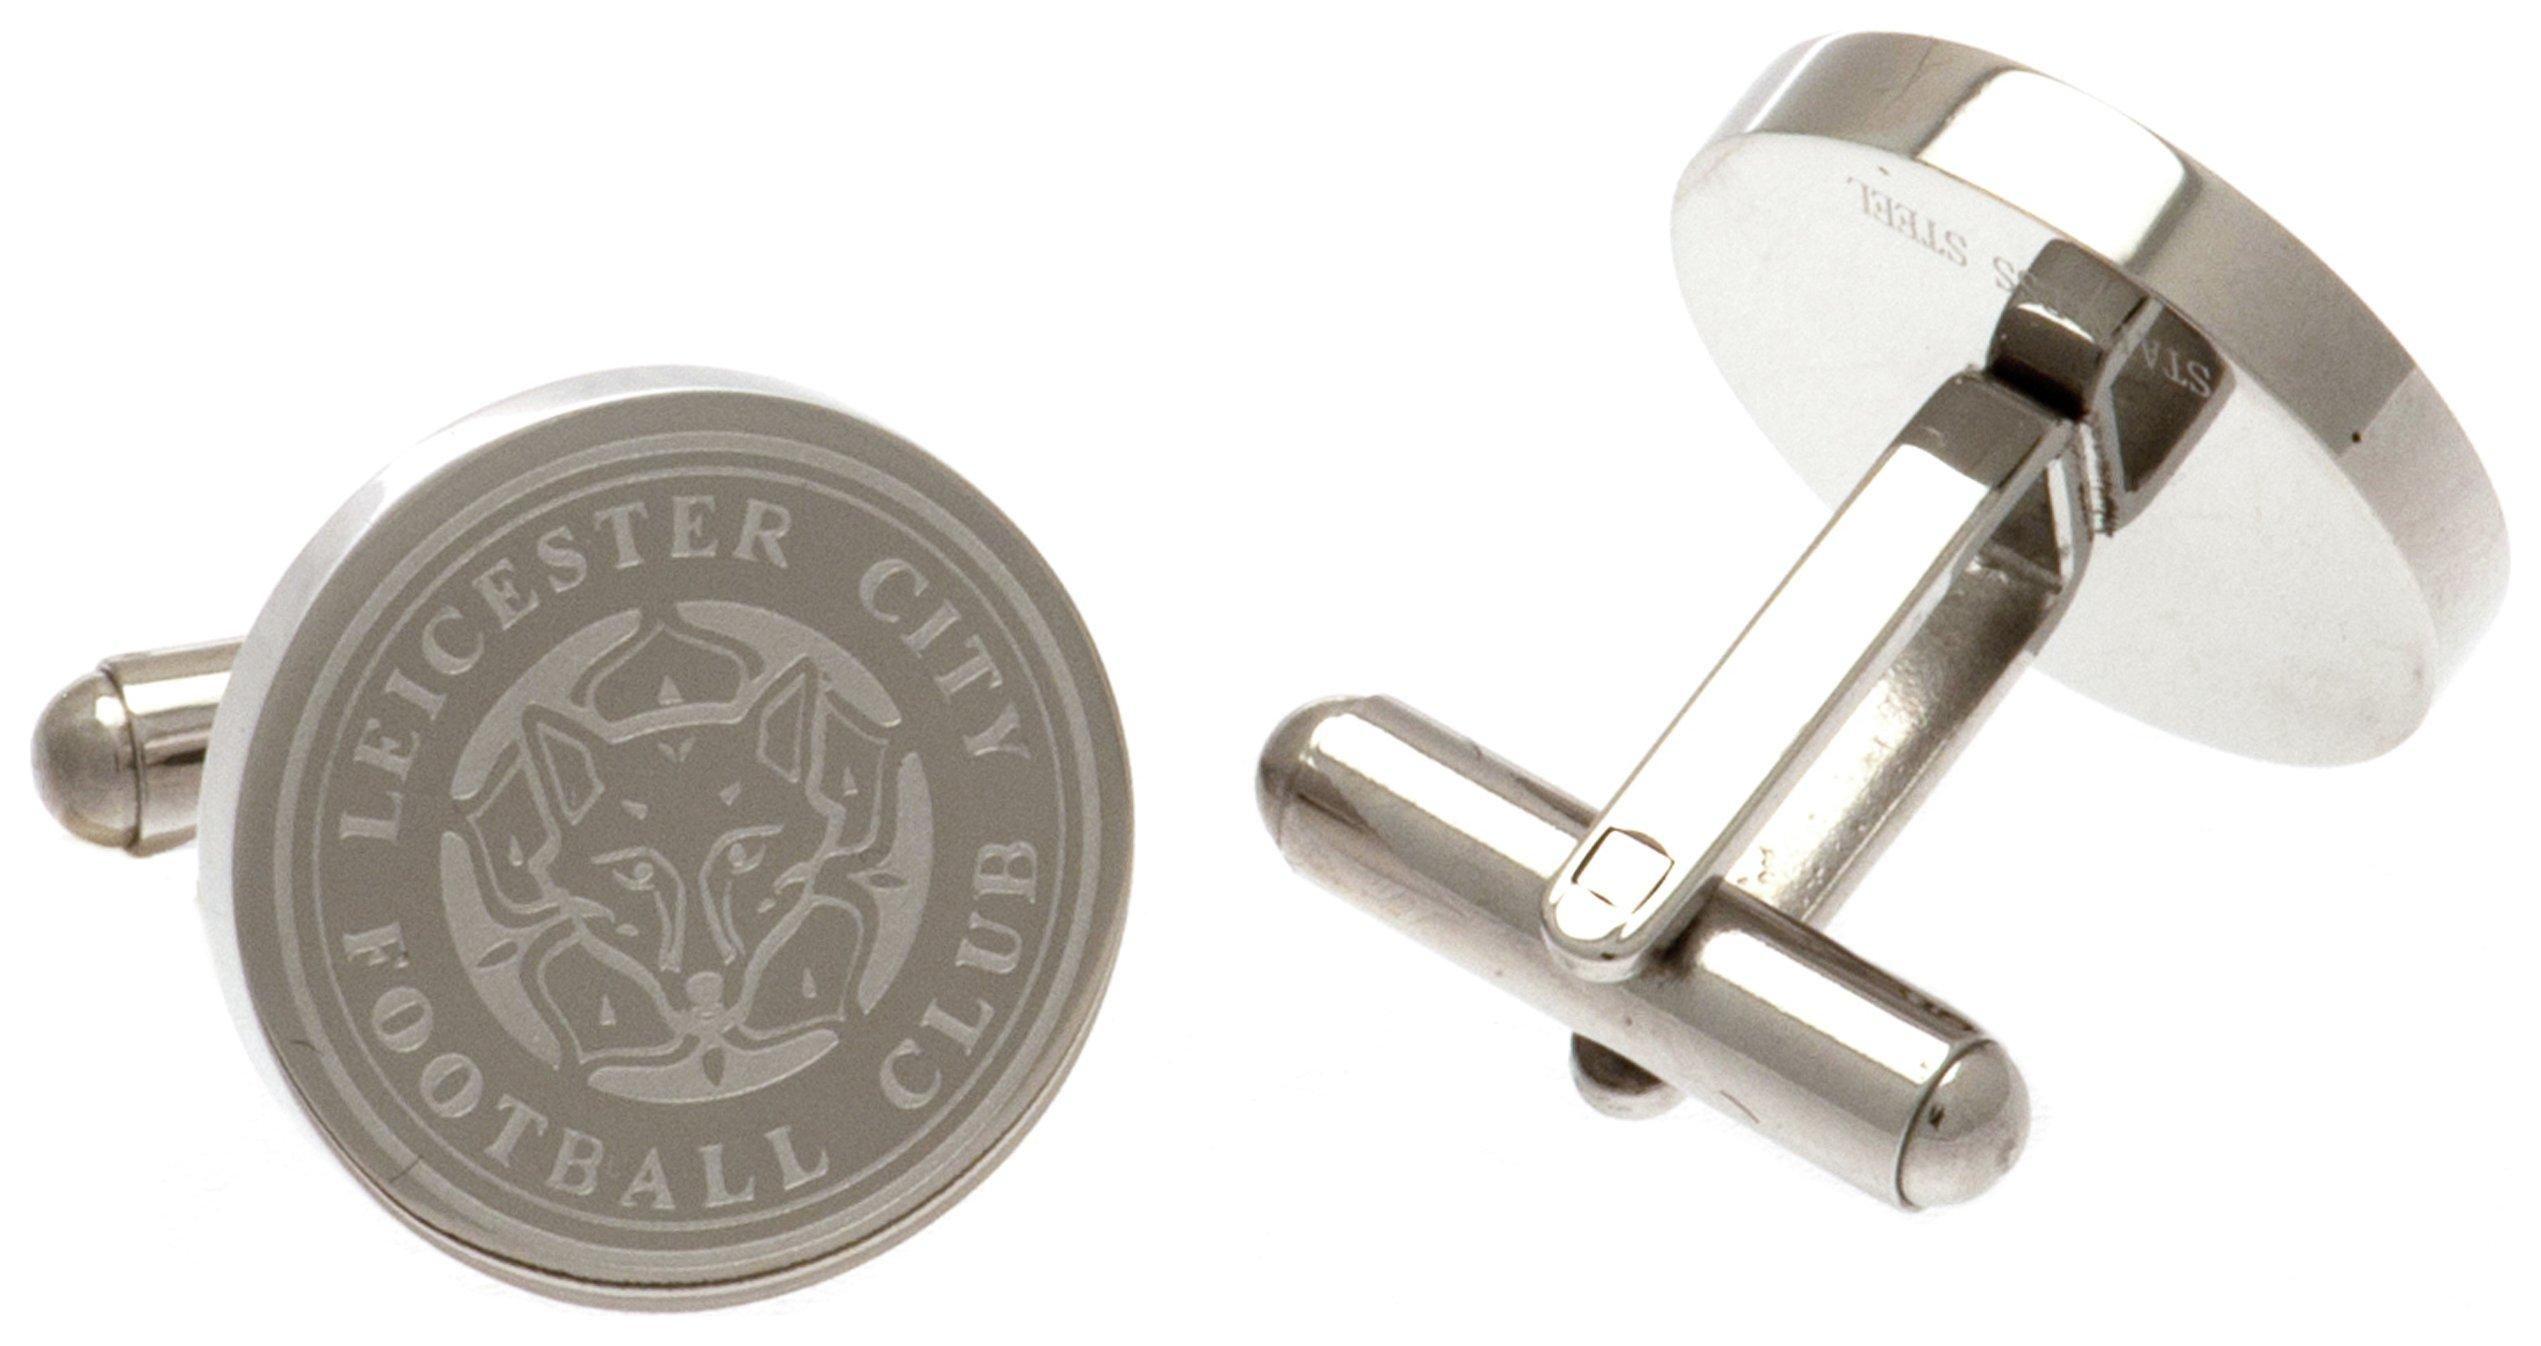 Stainless Steel Leicester City Crest Cufflinks